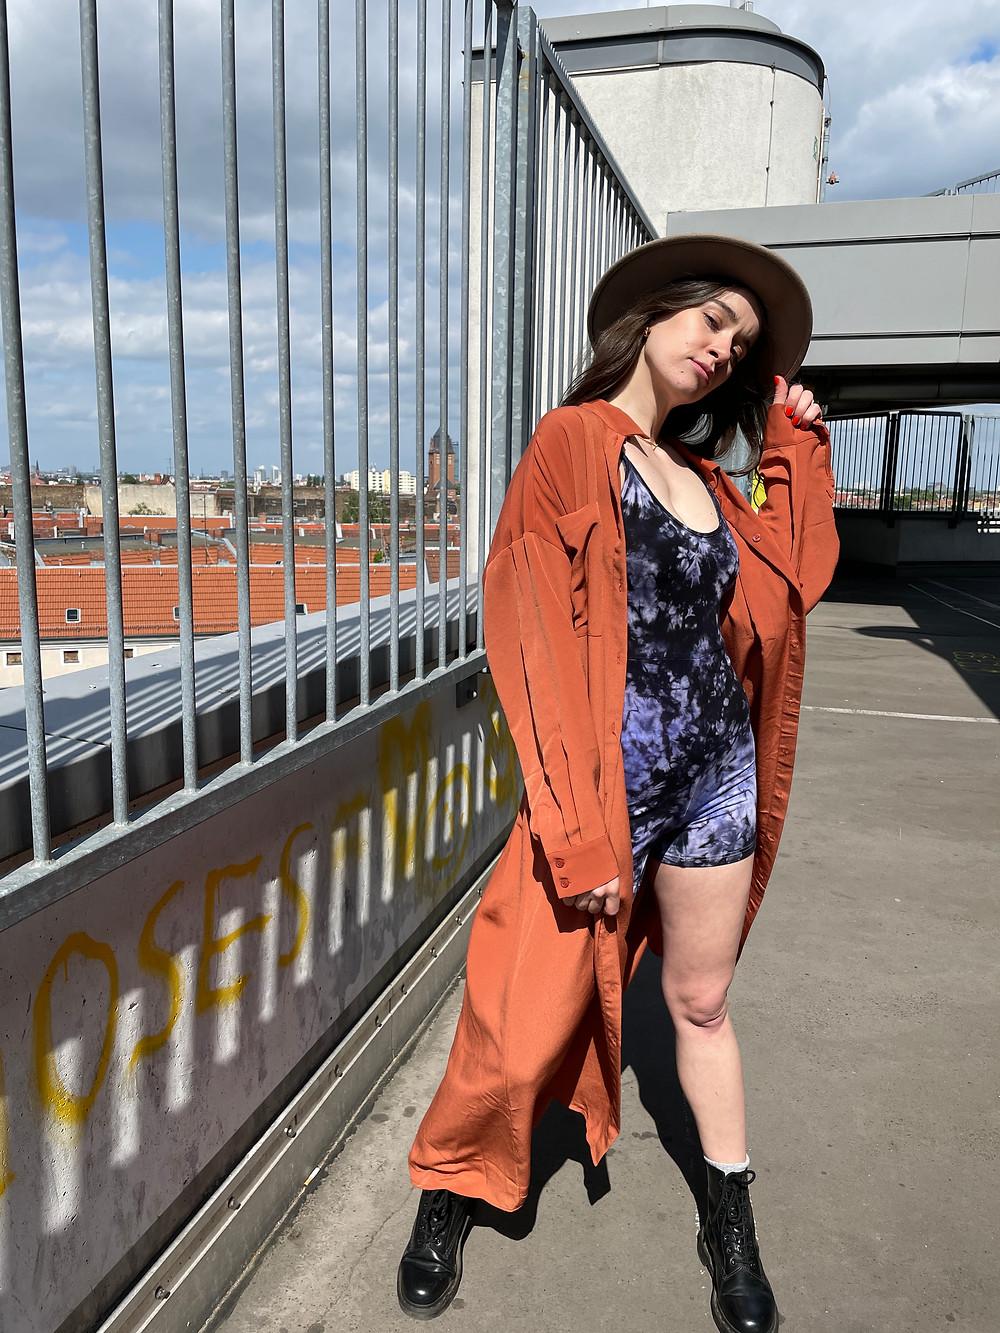 Tinalicious Freizeit Outfit - Tie Dye Catsuit